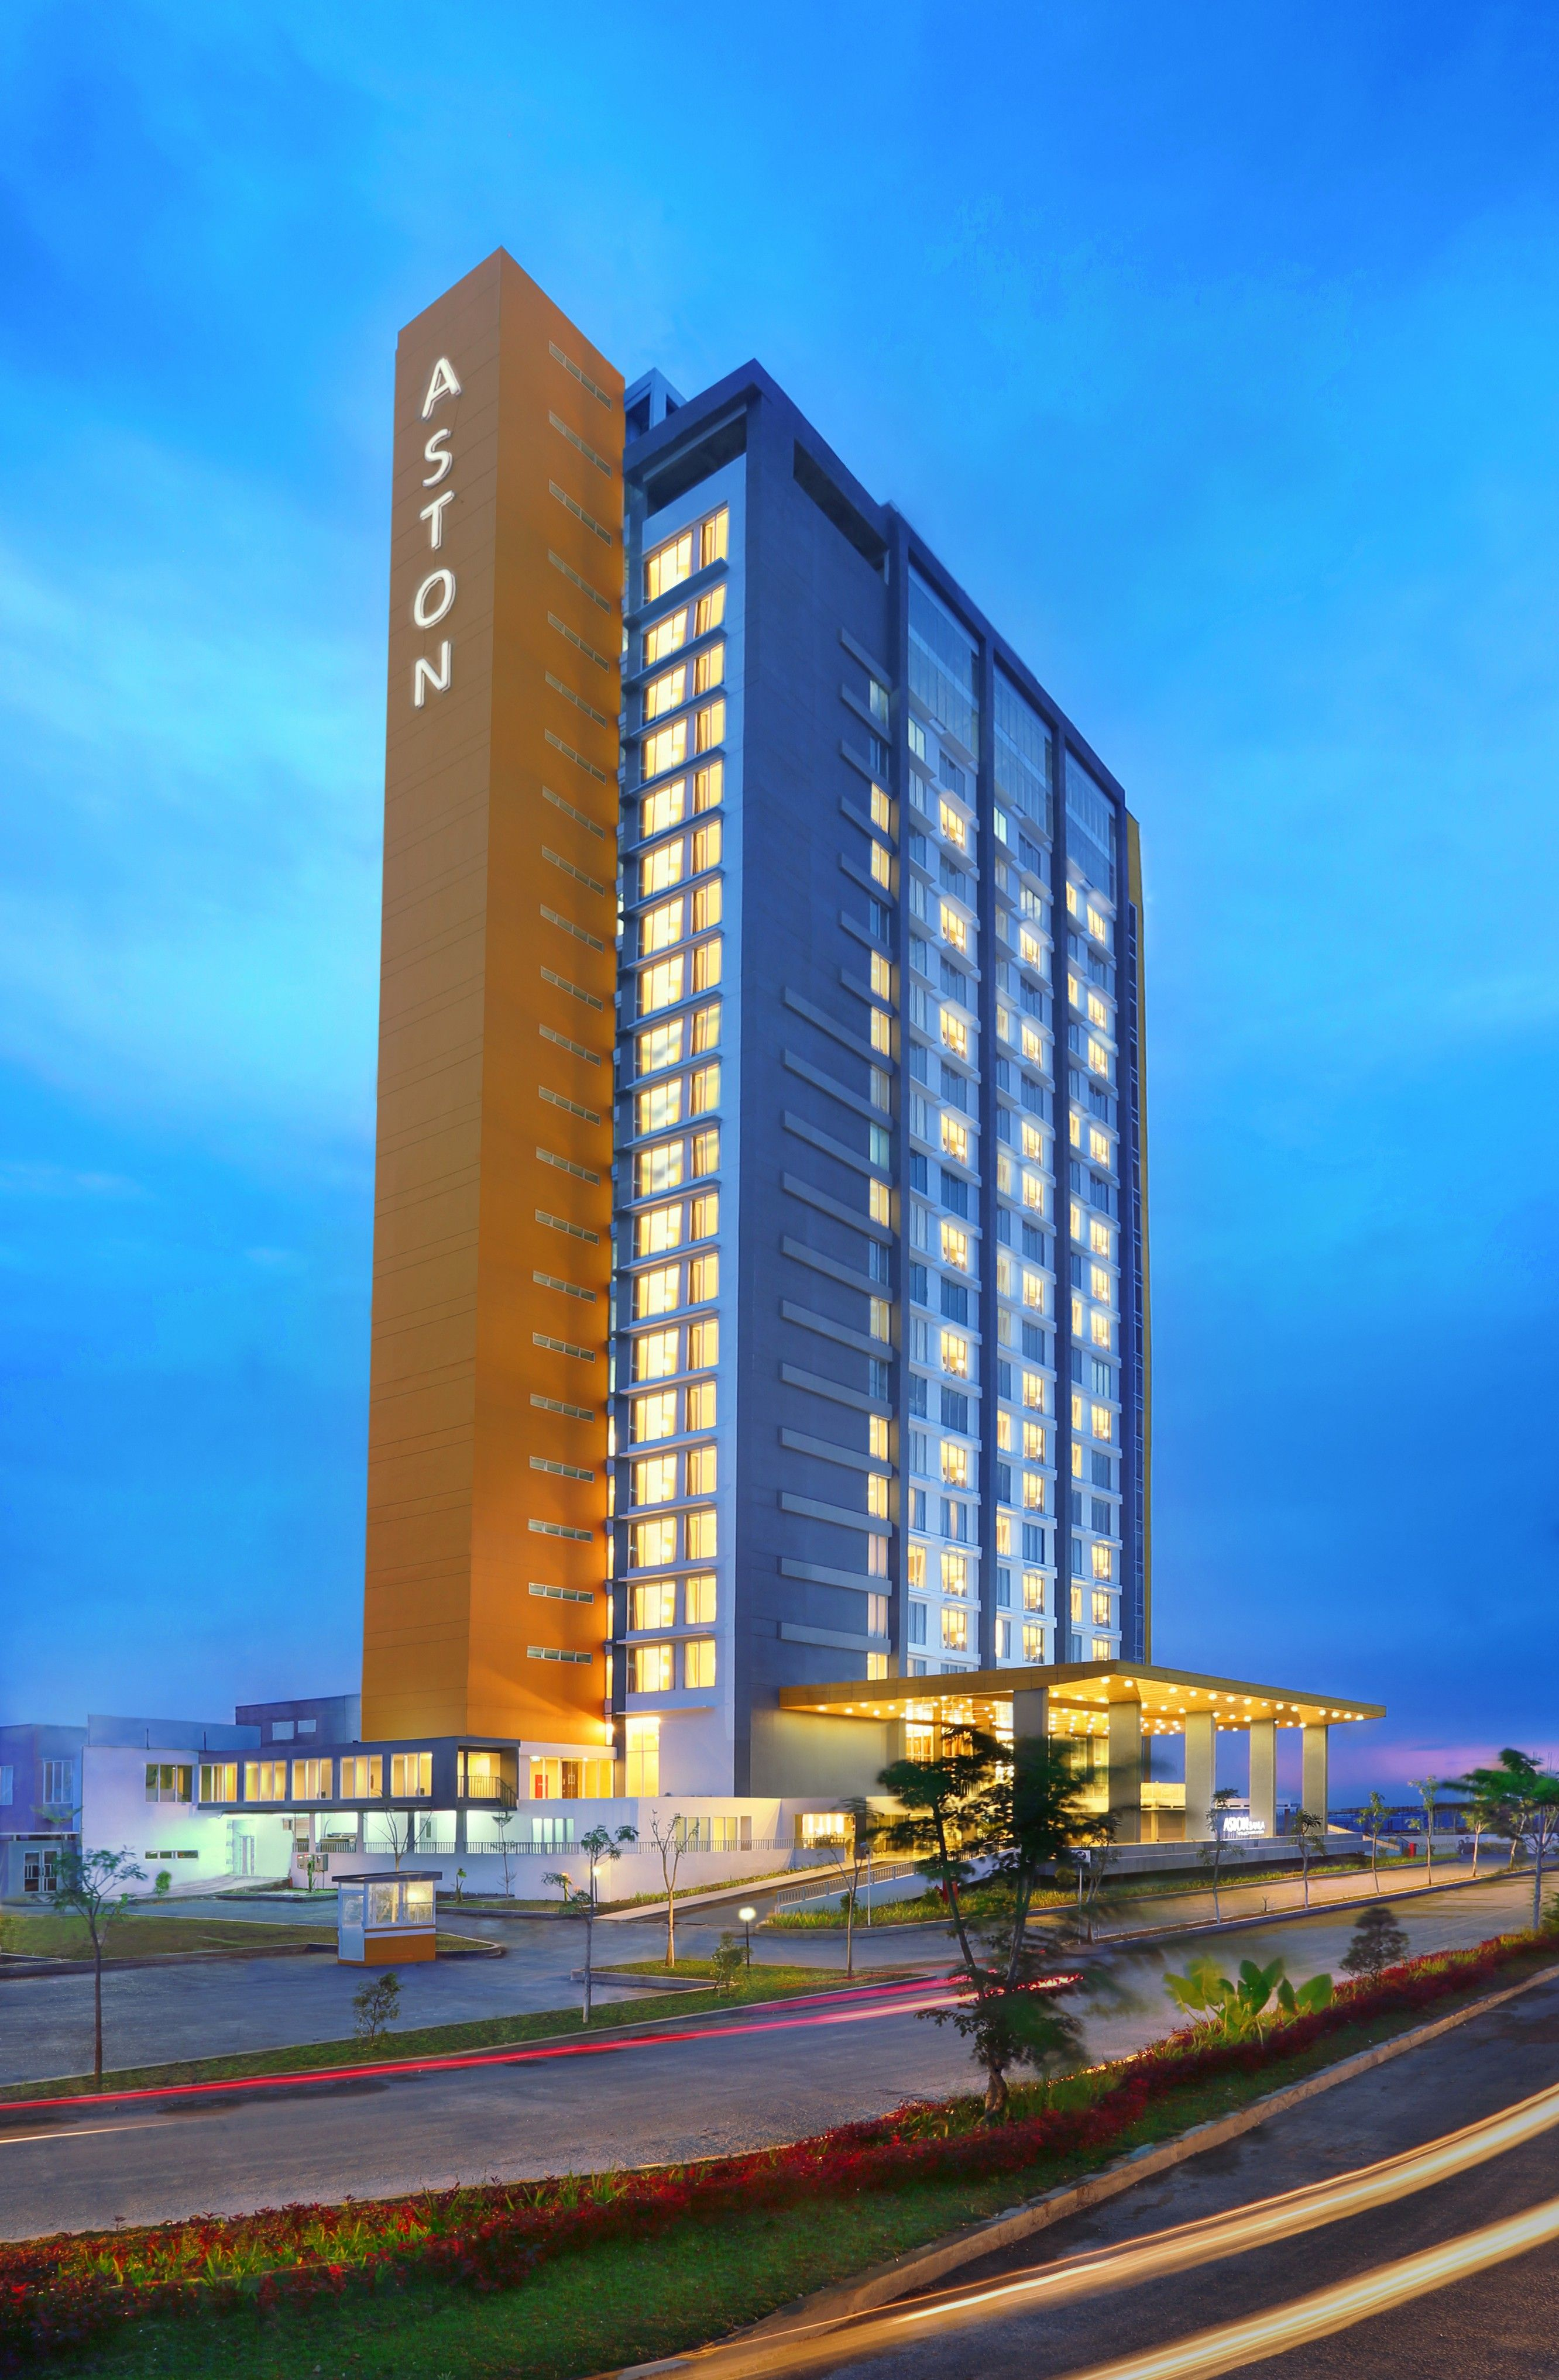 Aston Banua Hotel & Convention Center, Banjar